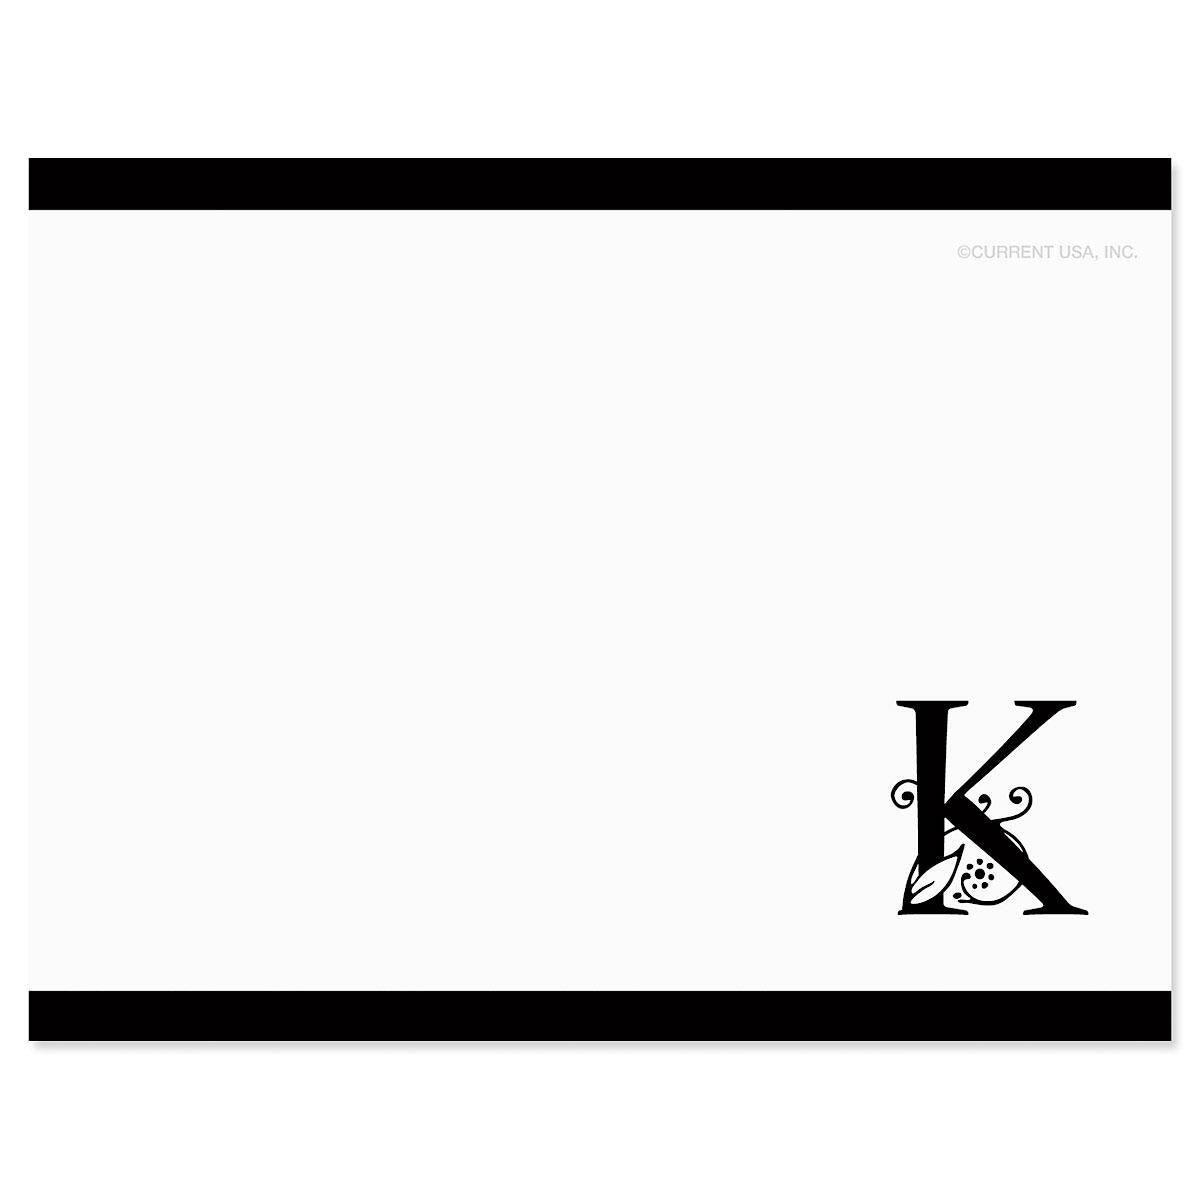 Formal Initial Correspondence Card